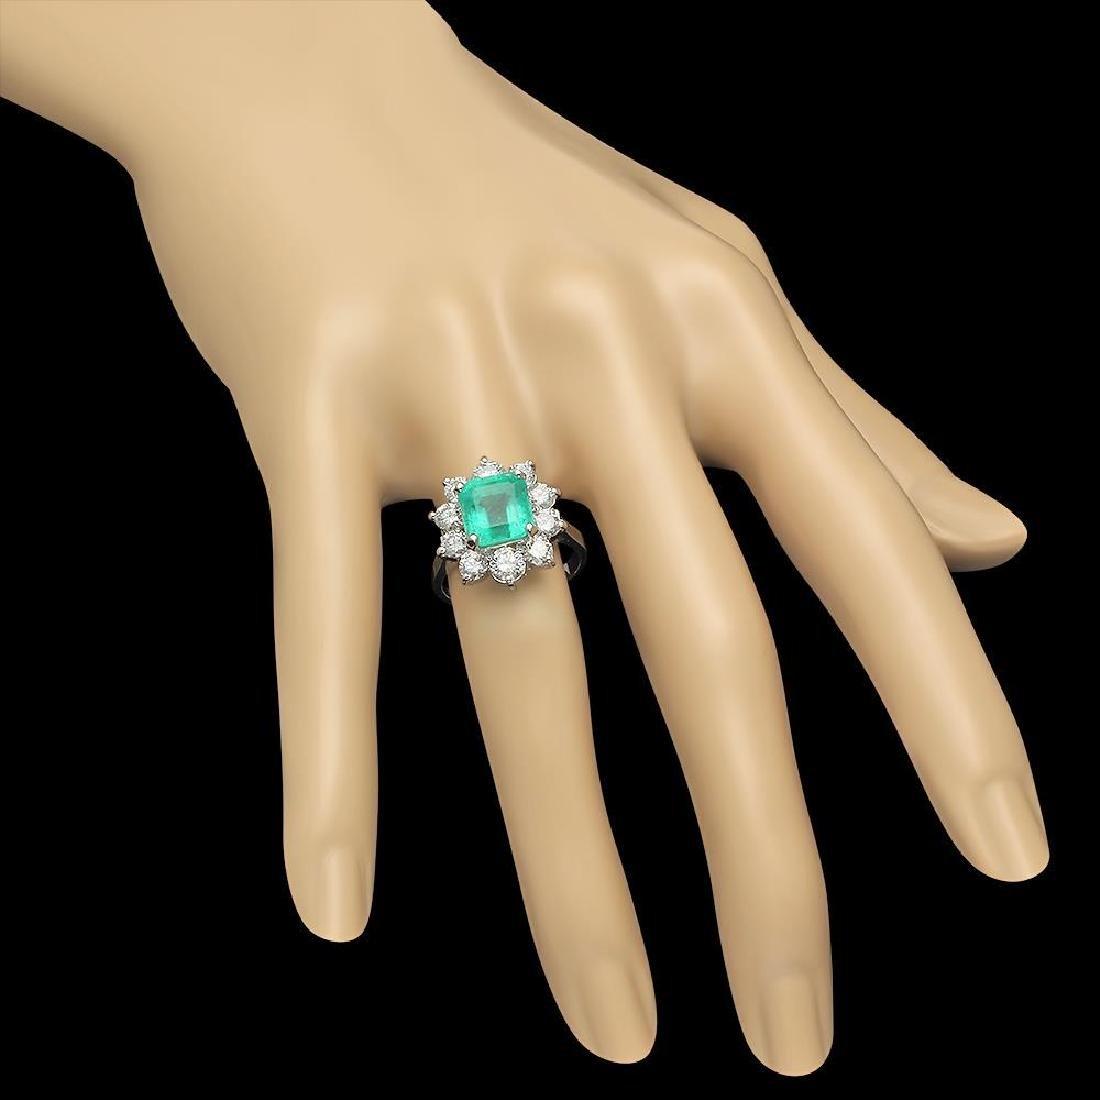 14K Gold 3.49ct Emerald 2.00ct Diamond Ring - 3